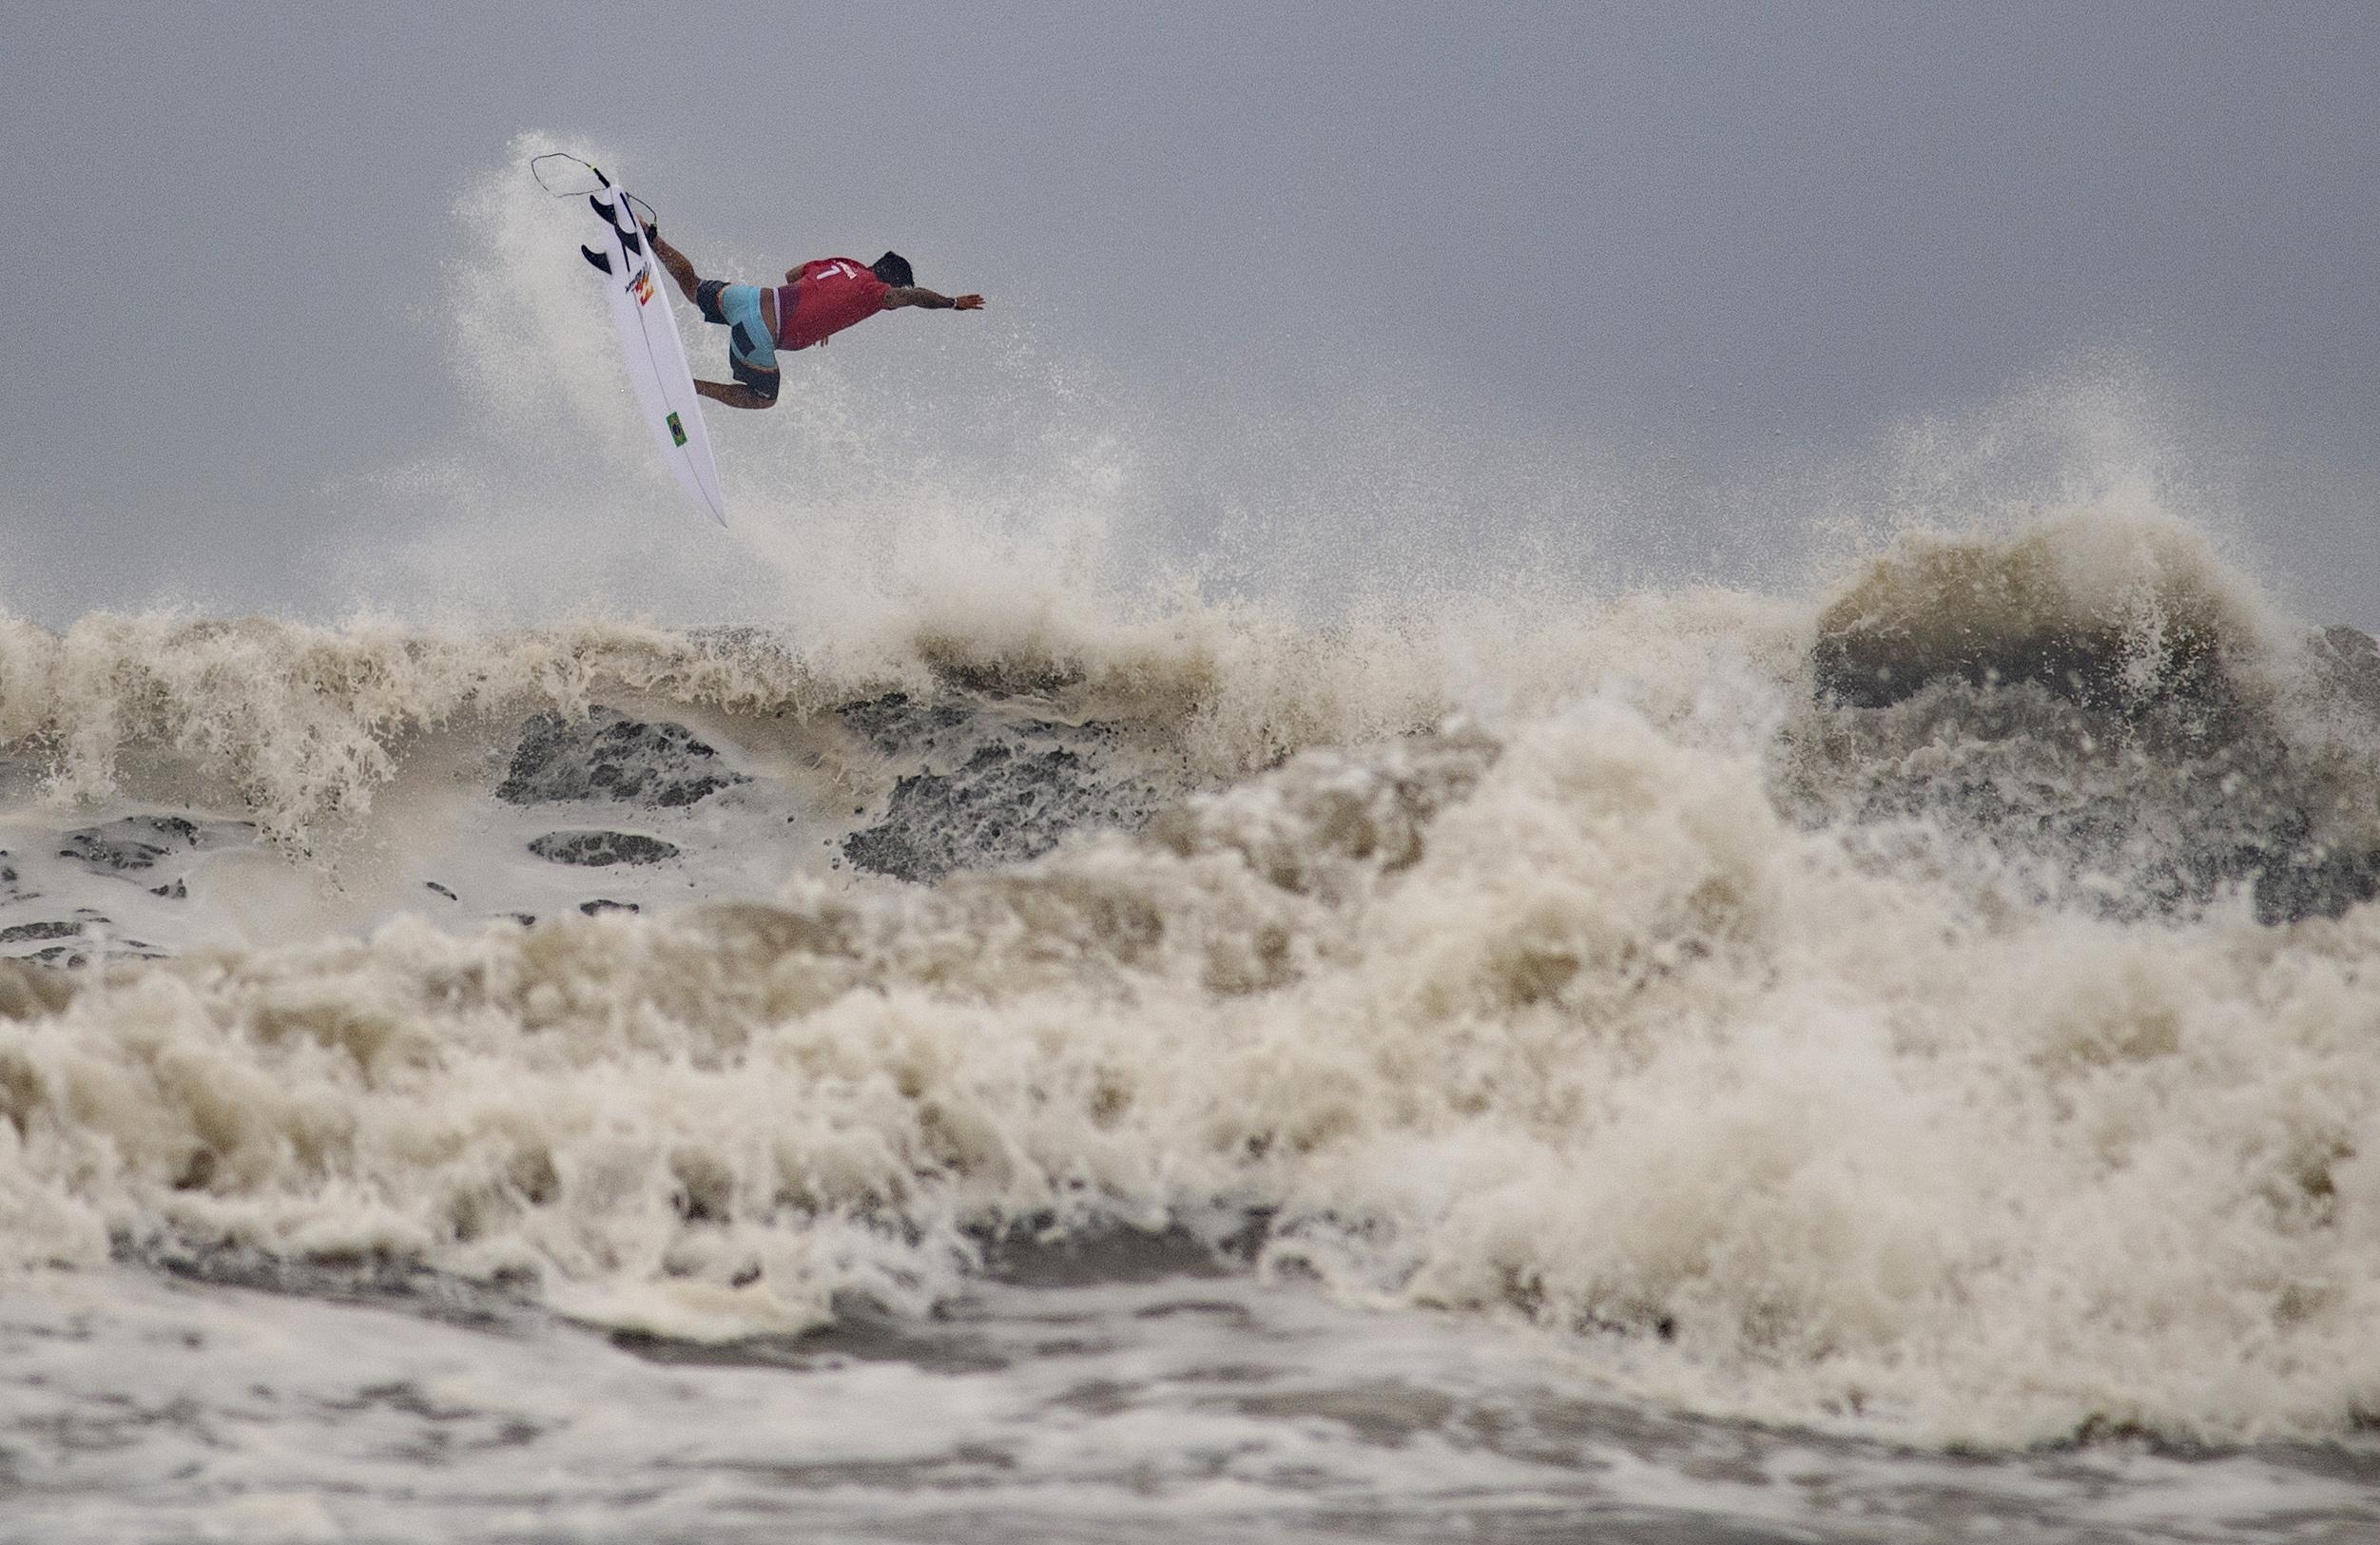 Tokyo 2020 Olympics - Surfing - Men's Shortboard - Quarterfinals - Tsurigasaki Surfing Beach, Tokyo, Japan - July 27, 2021. Italo Ferreira of Brazil in action. Pool via REUTERS/Olivier Morin